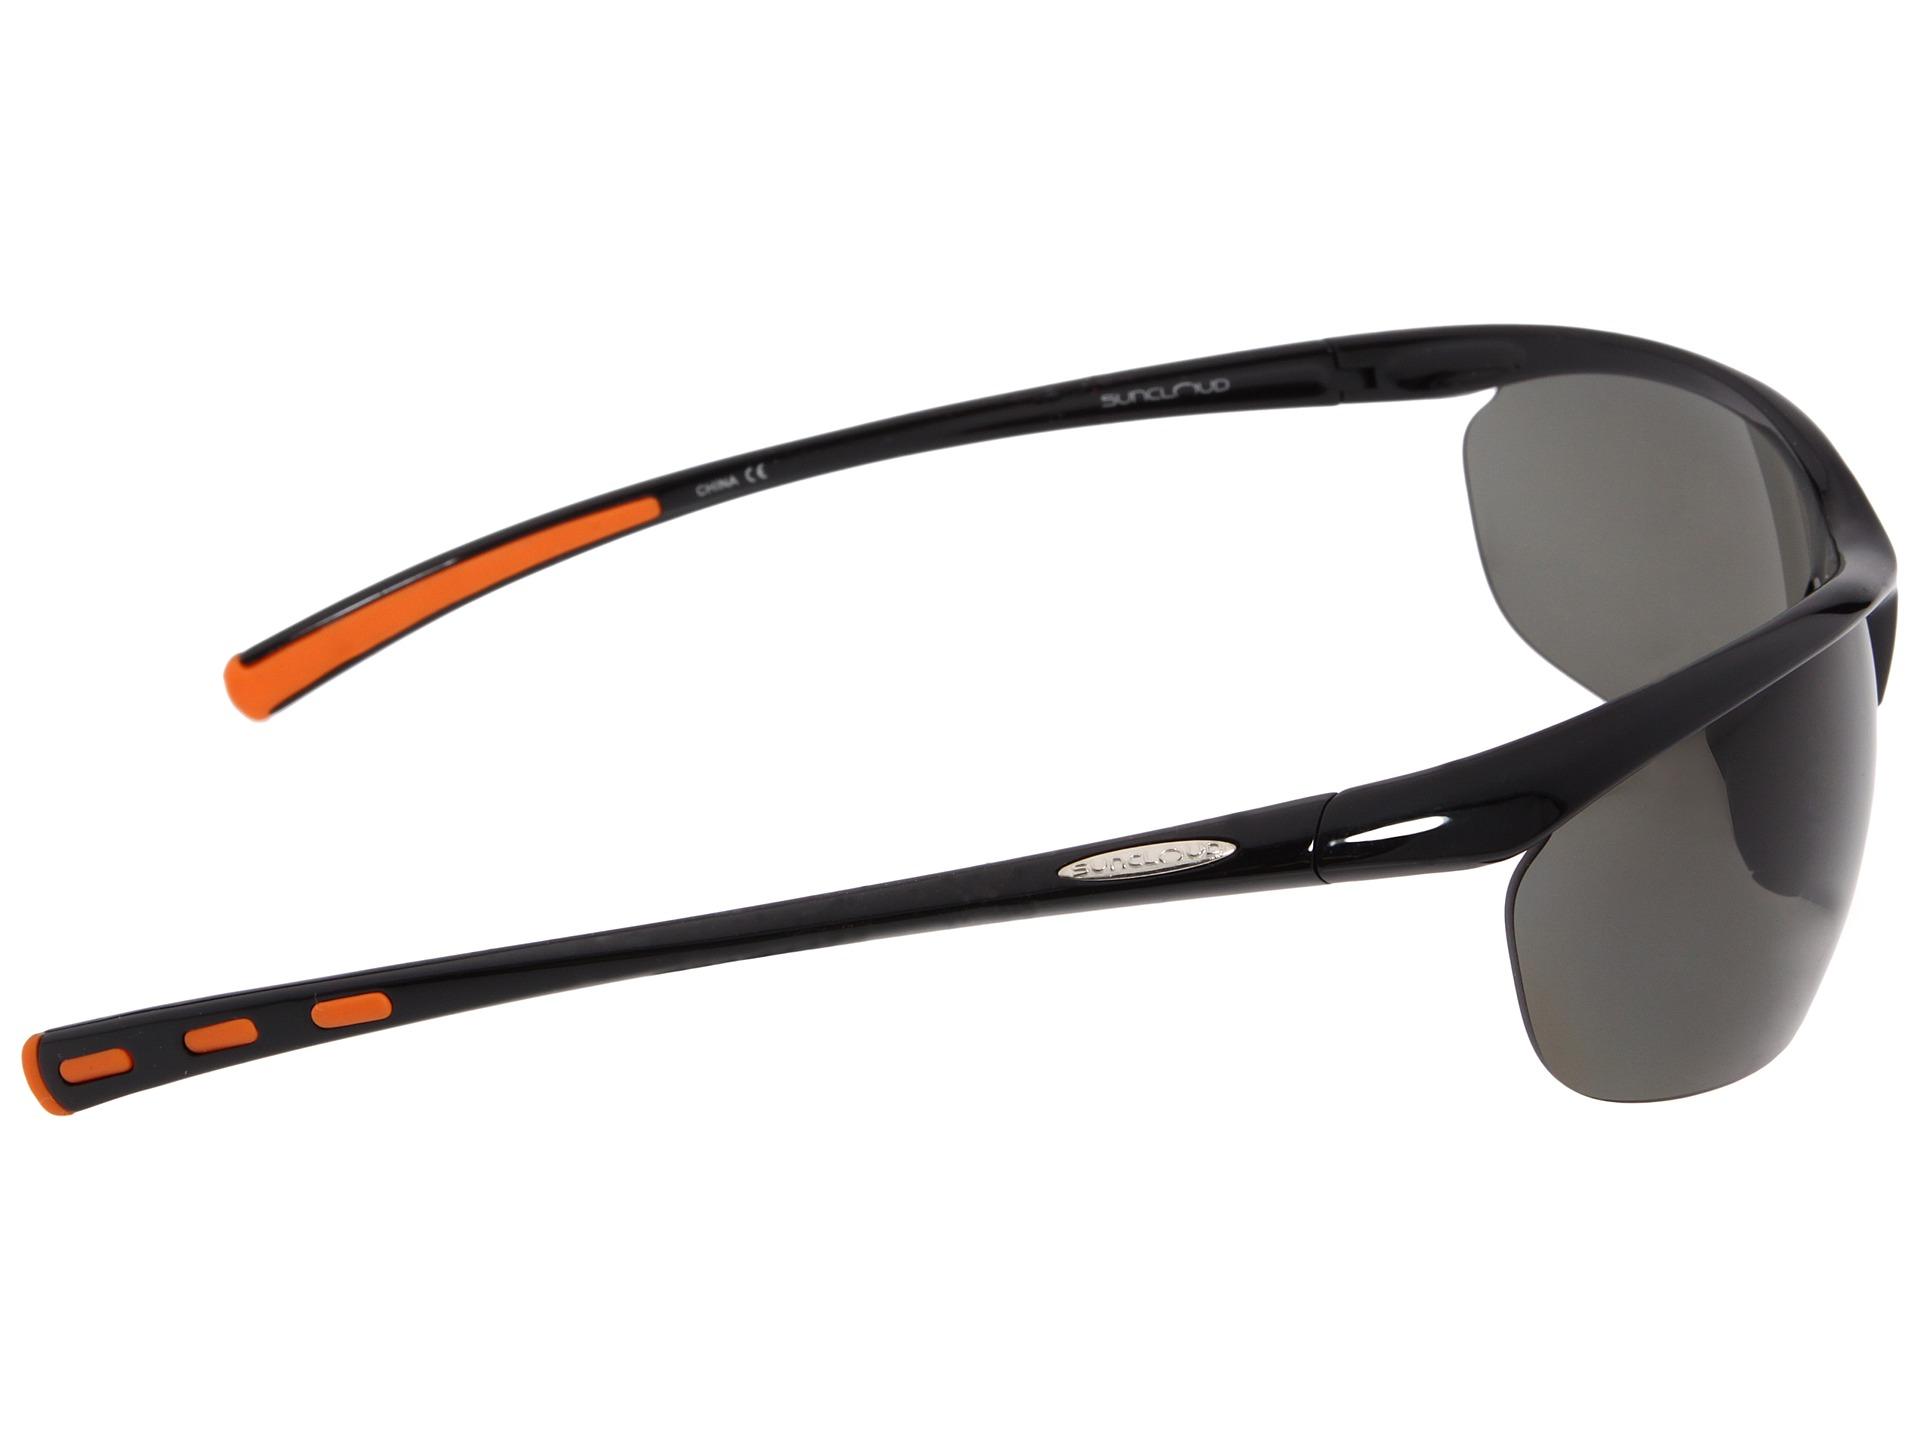 592700b0ca Suncloud Excursion Polarized Sunglasses Reviews